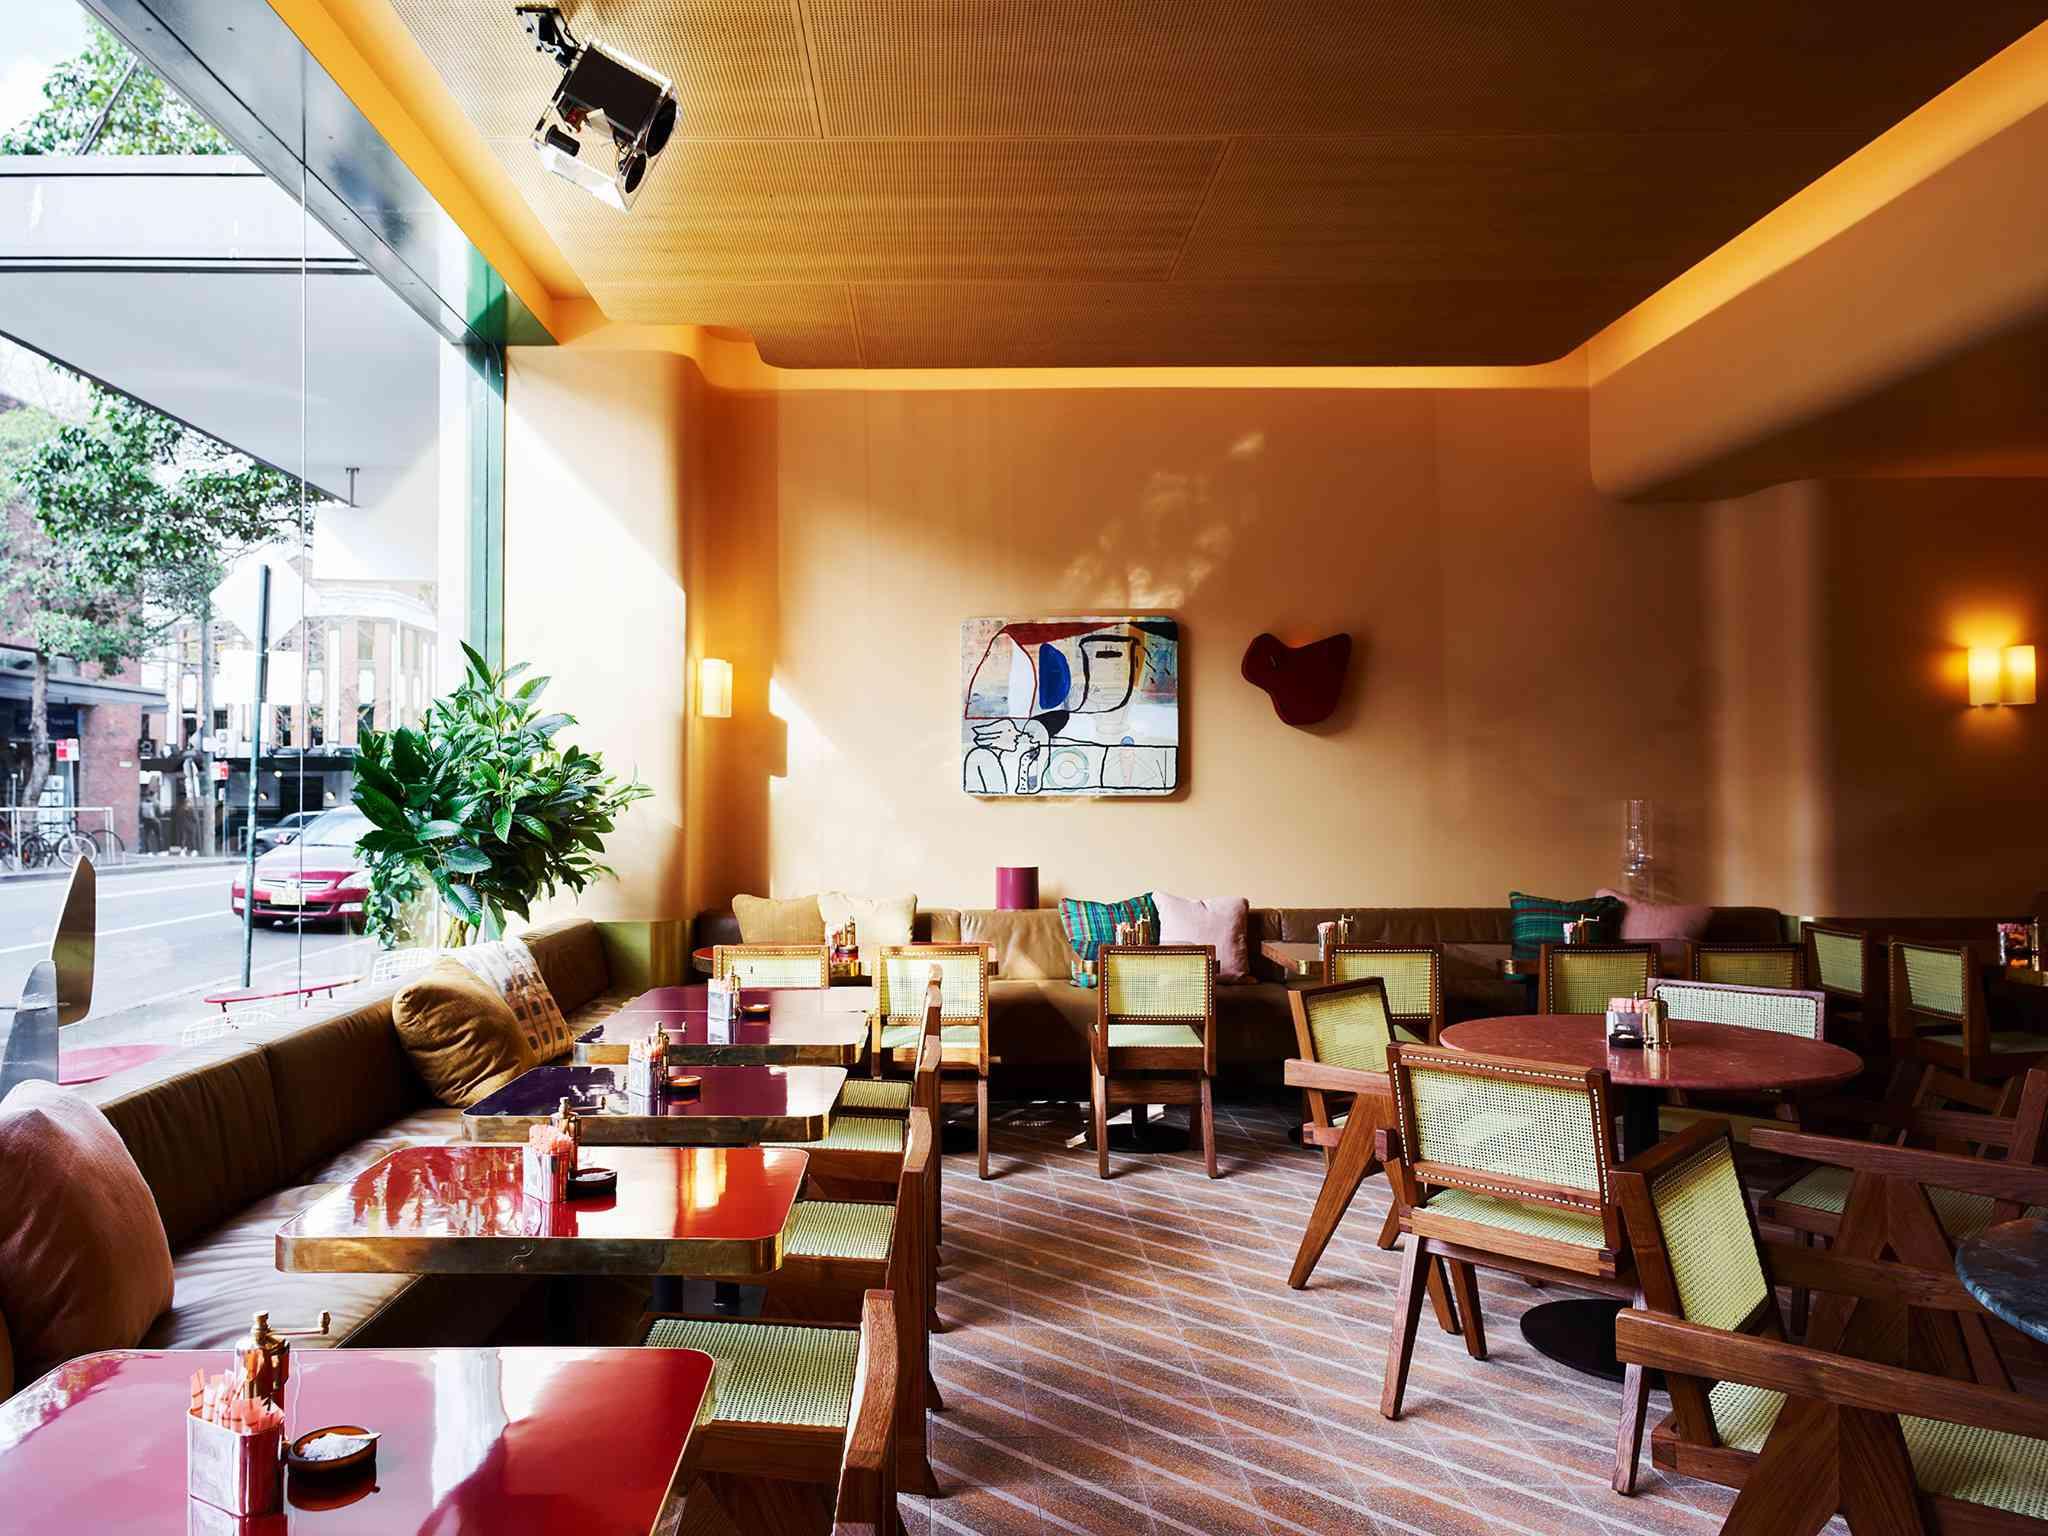 Dining room at Bills Surry Hills